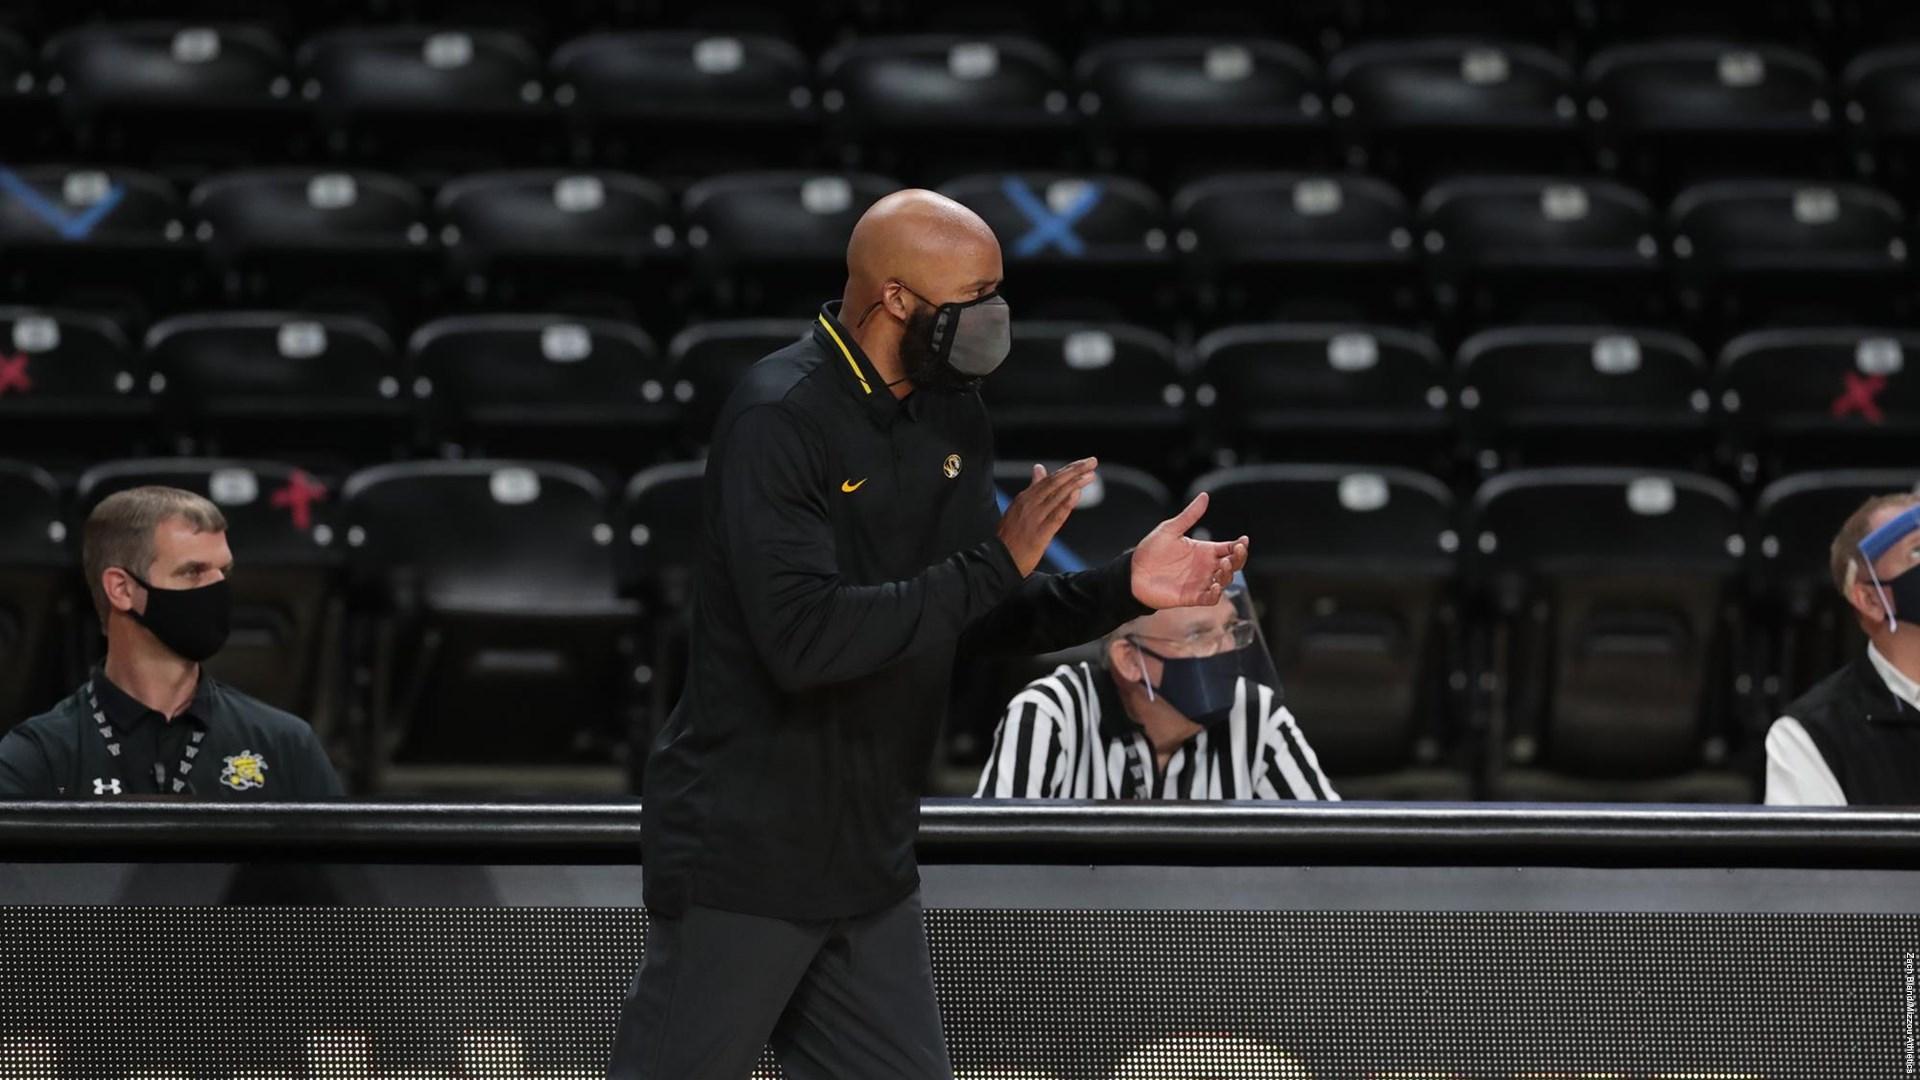 NCAA Men's Basketball: Mizzou Tigers vs. Wichita State Shockers